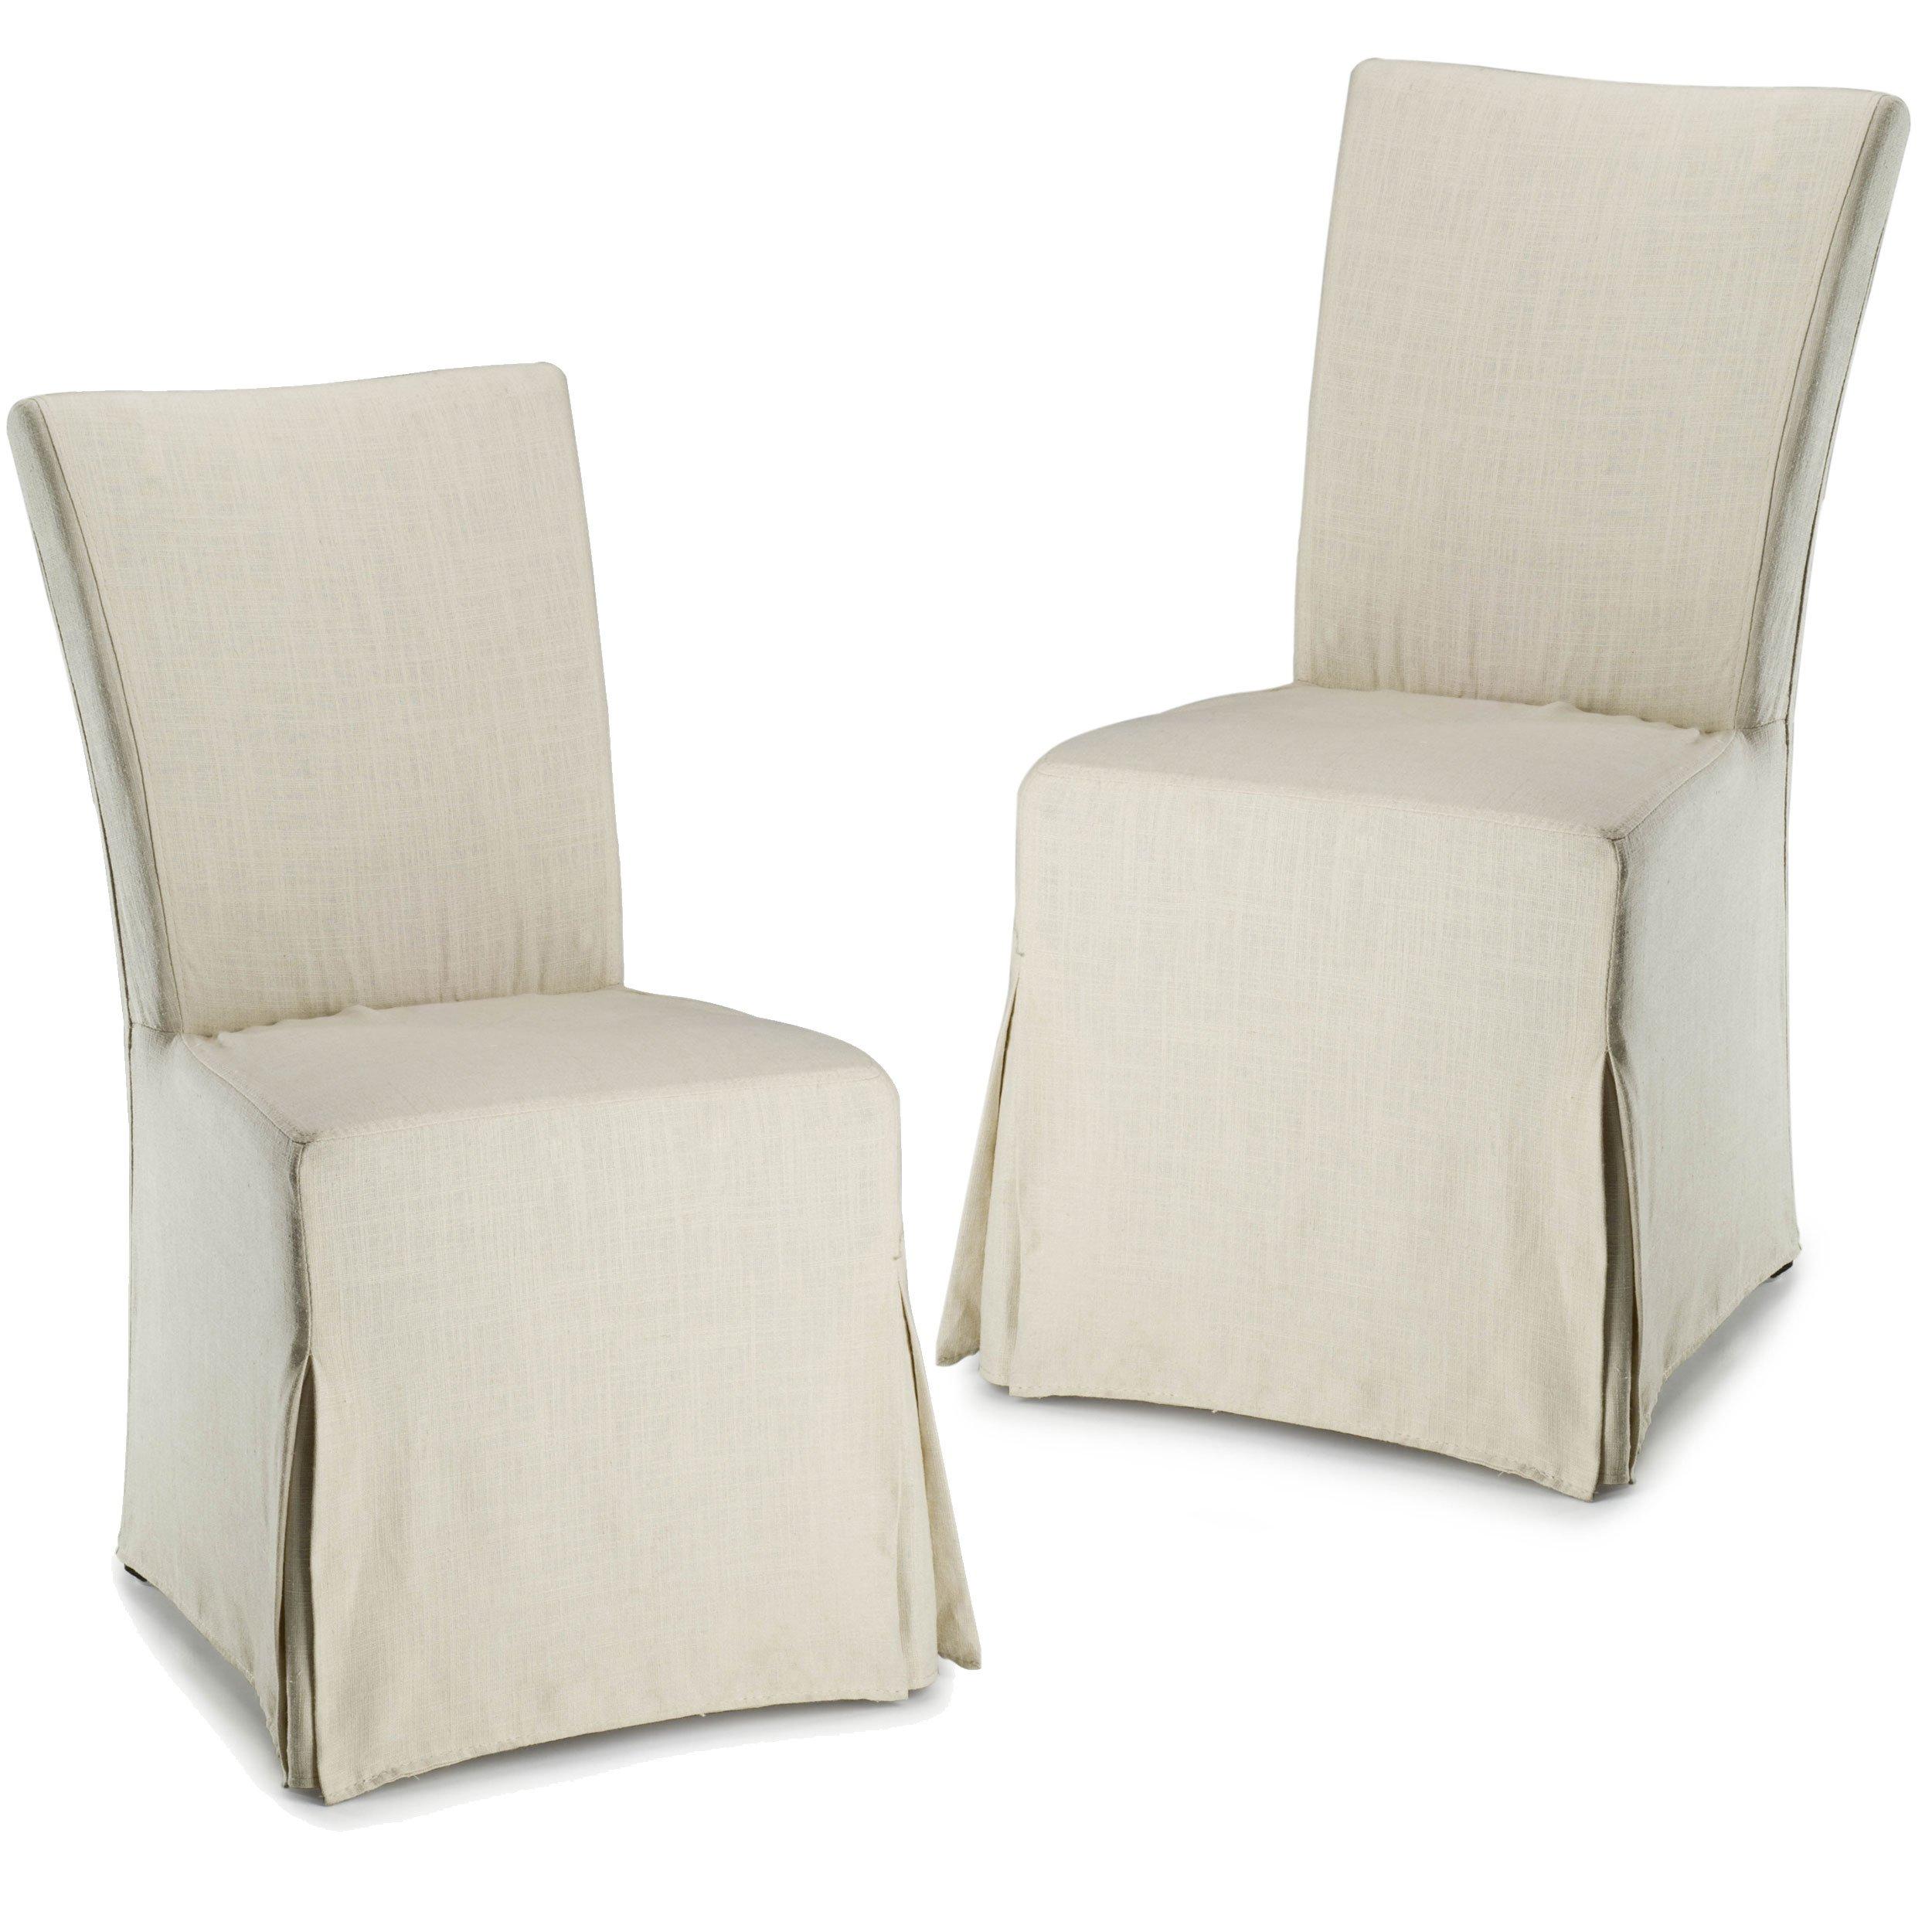 Safavieh Hudson Collection Ella Linen Slipcover Side Chairs, Beige, Set of 2